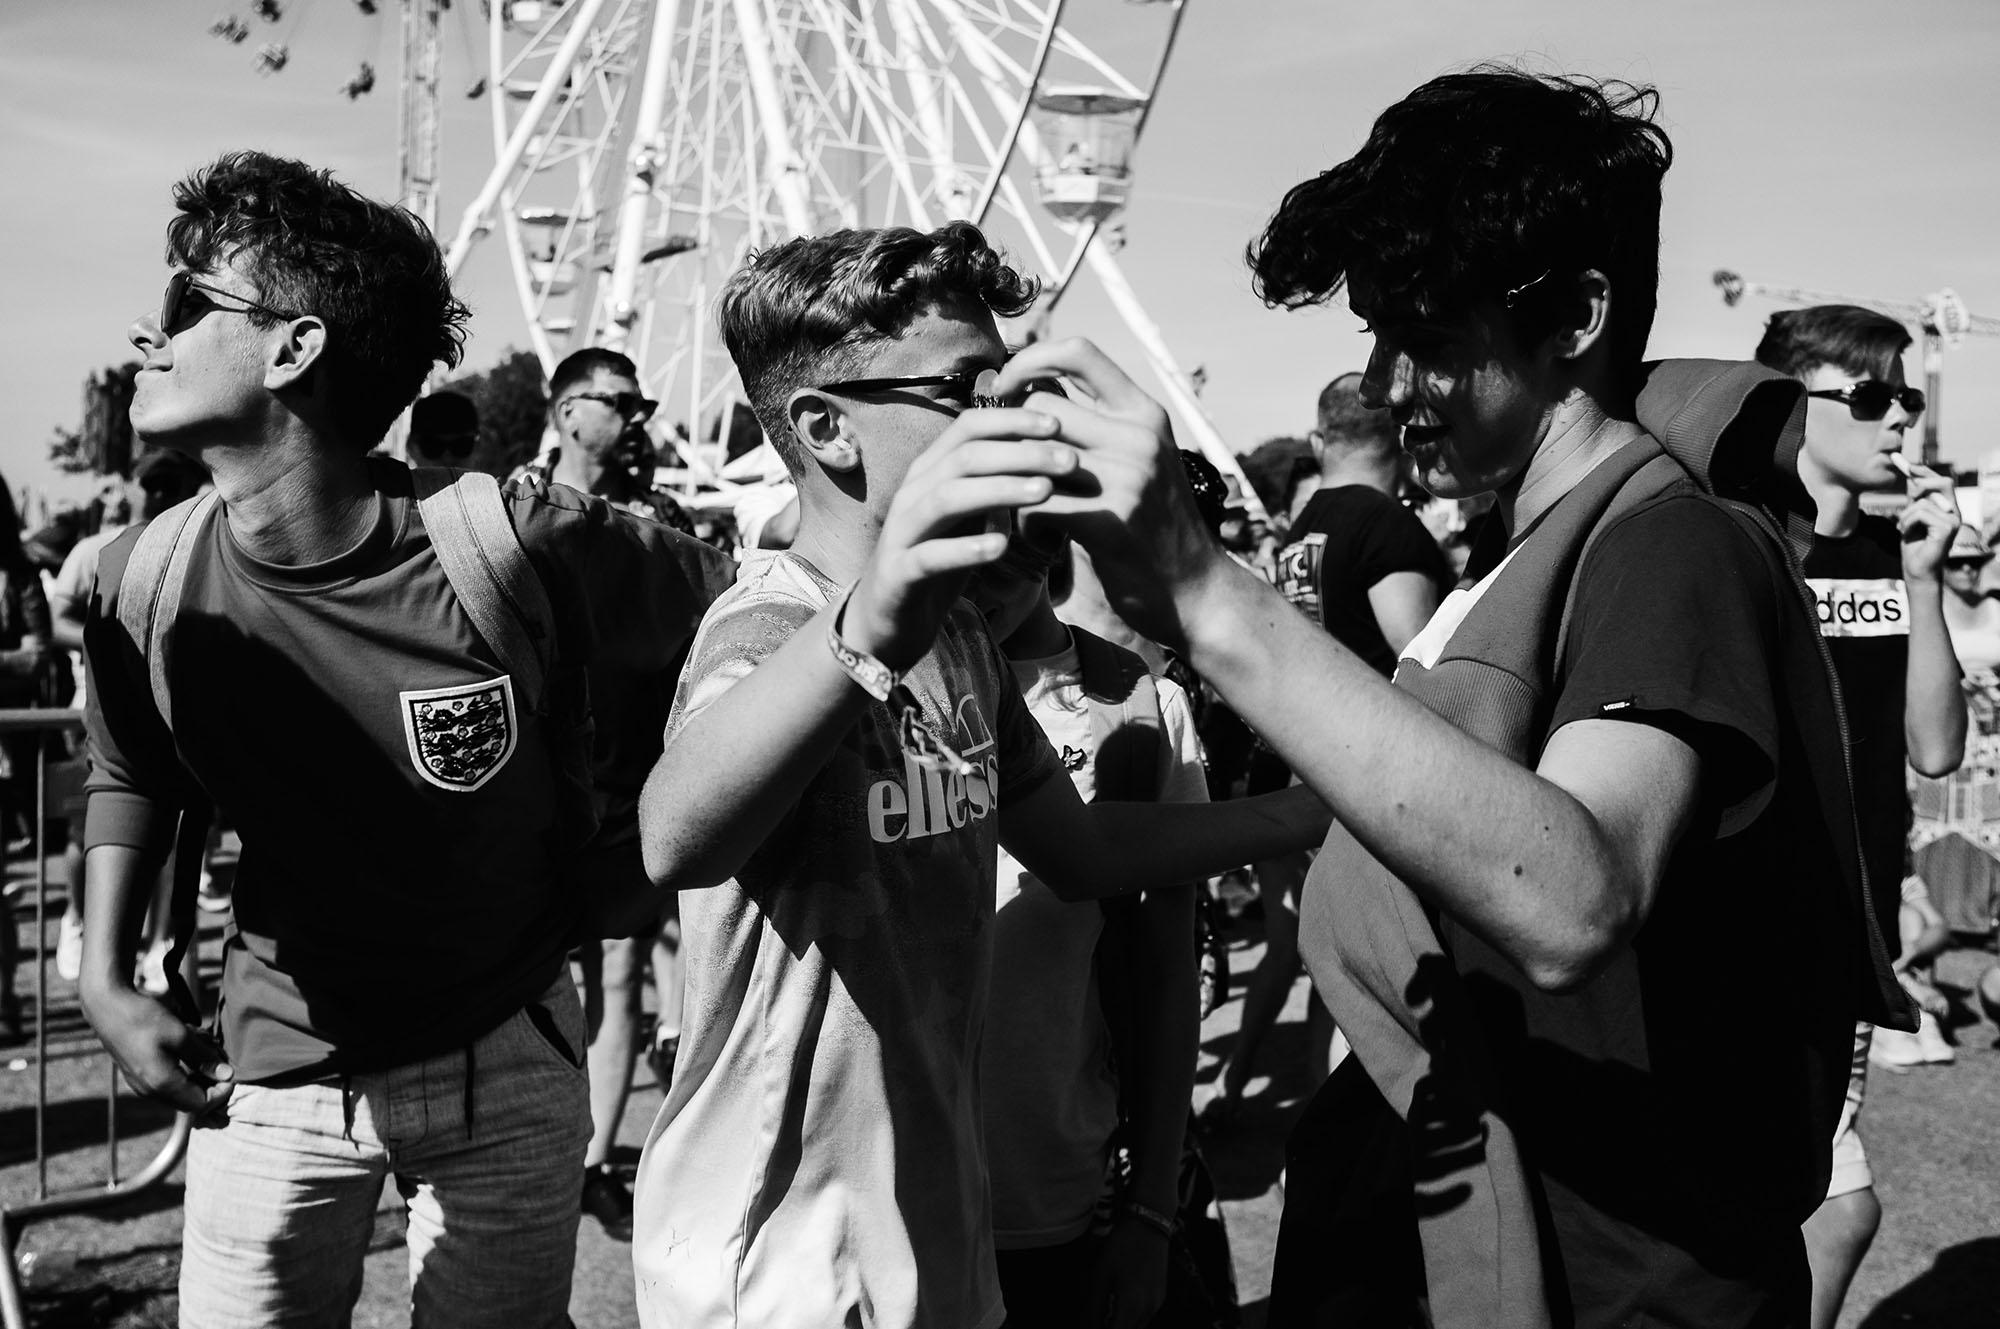 festival documentary photography